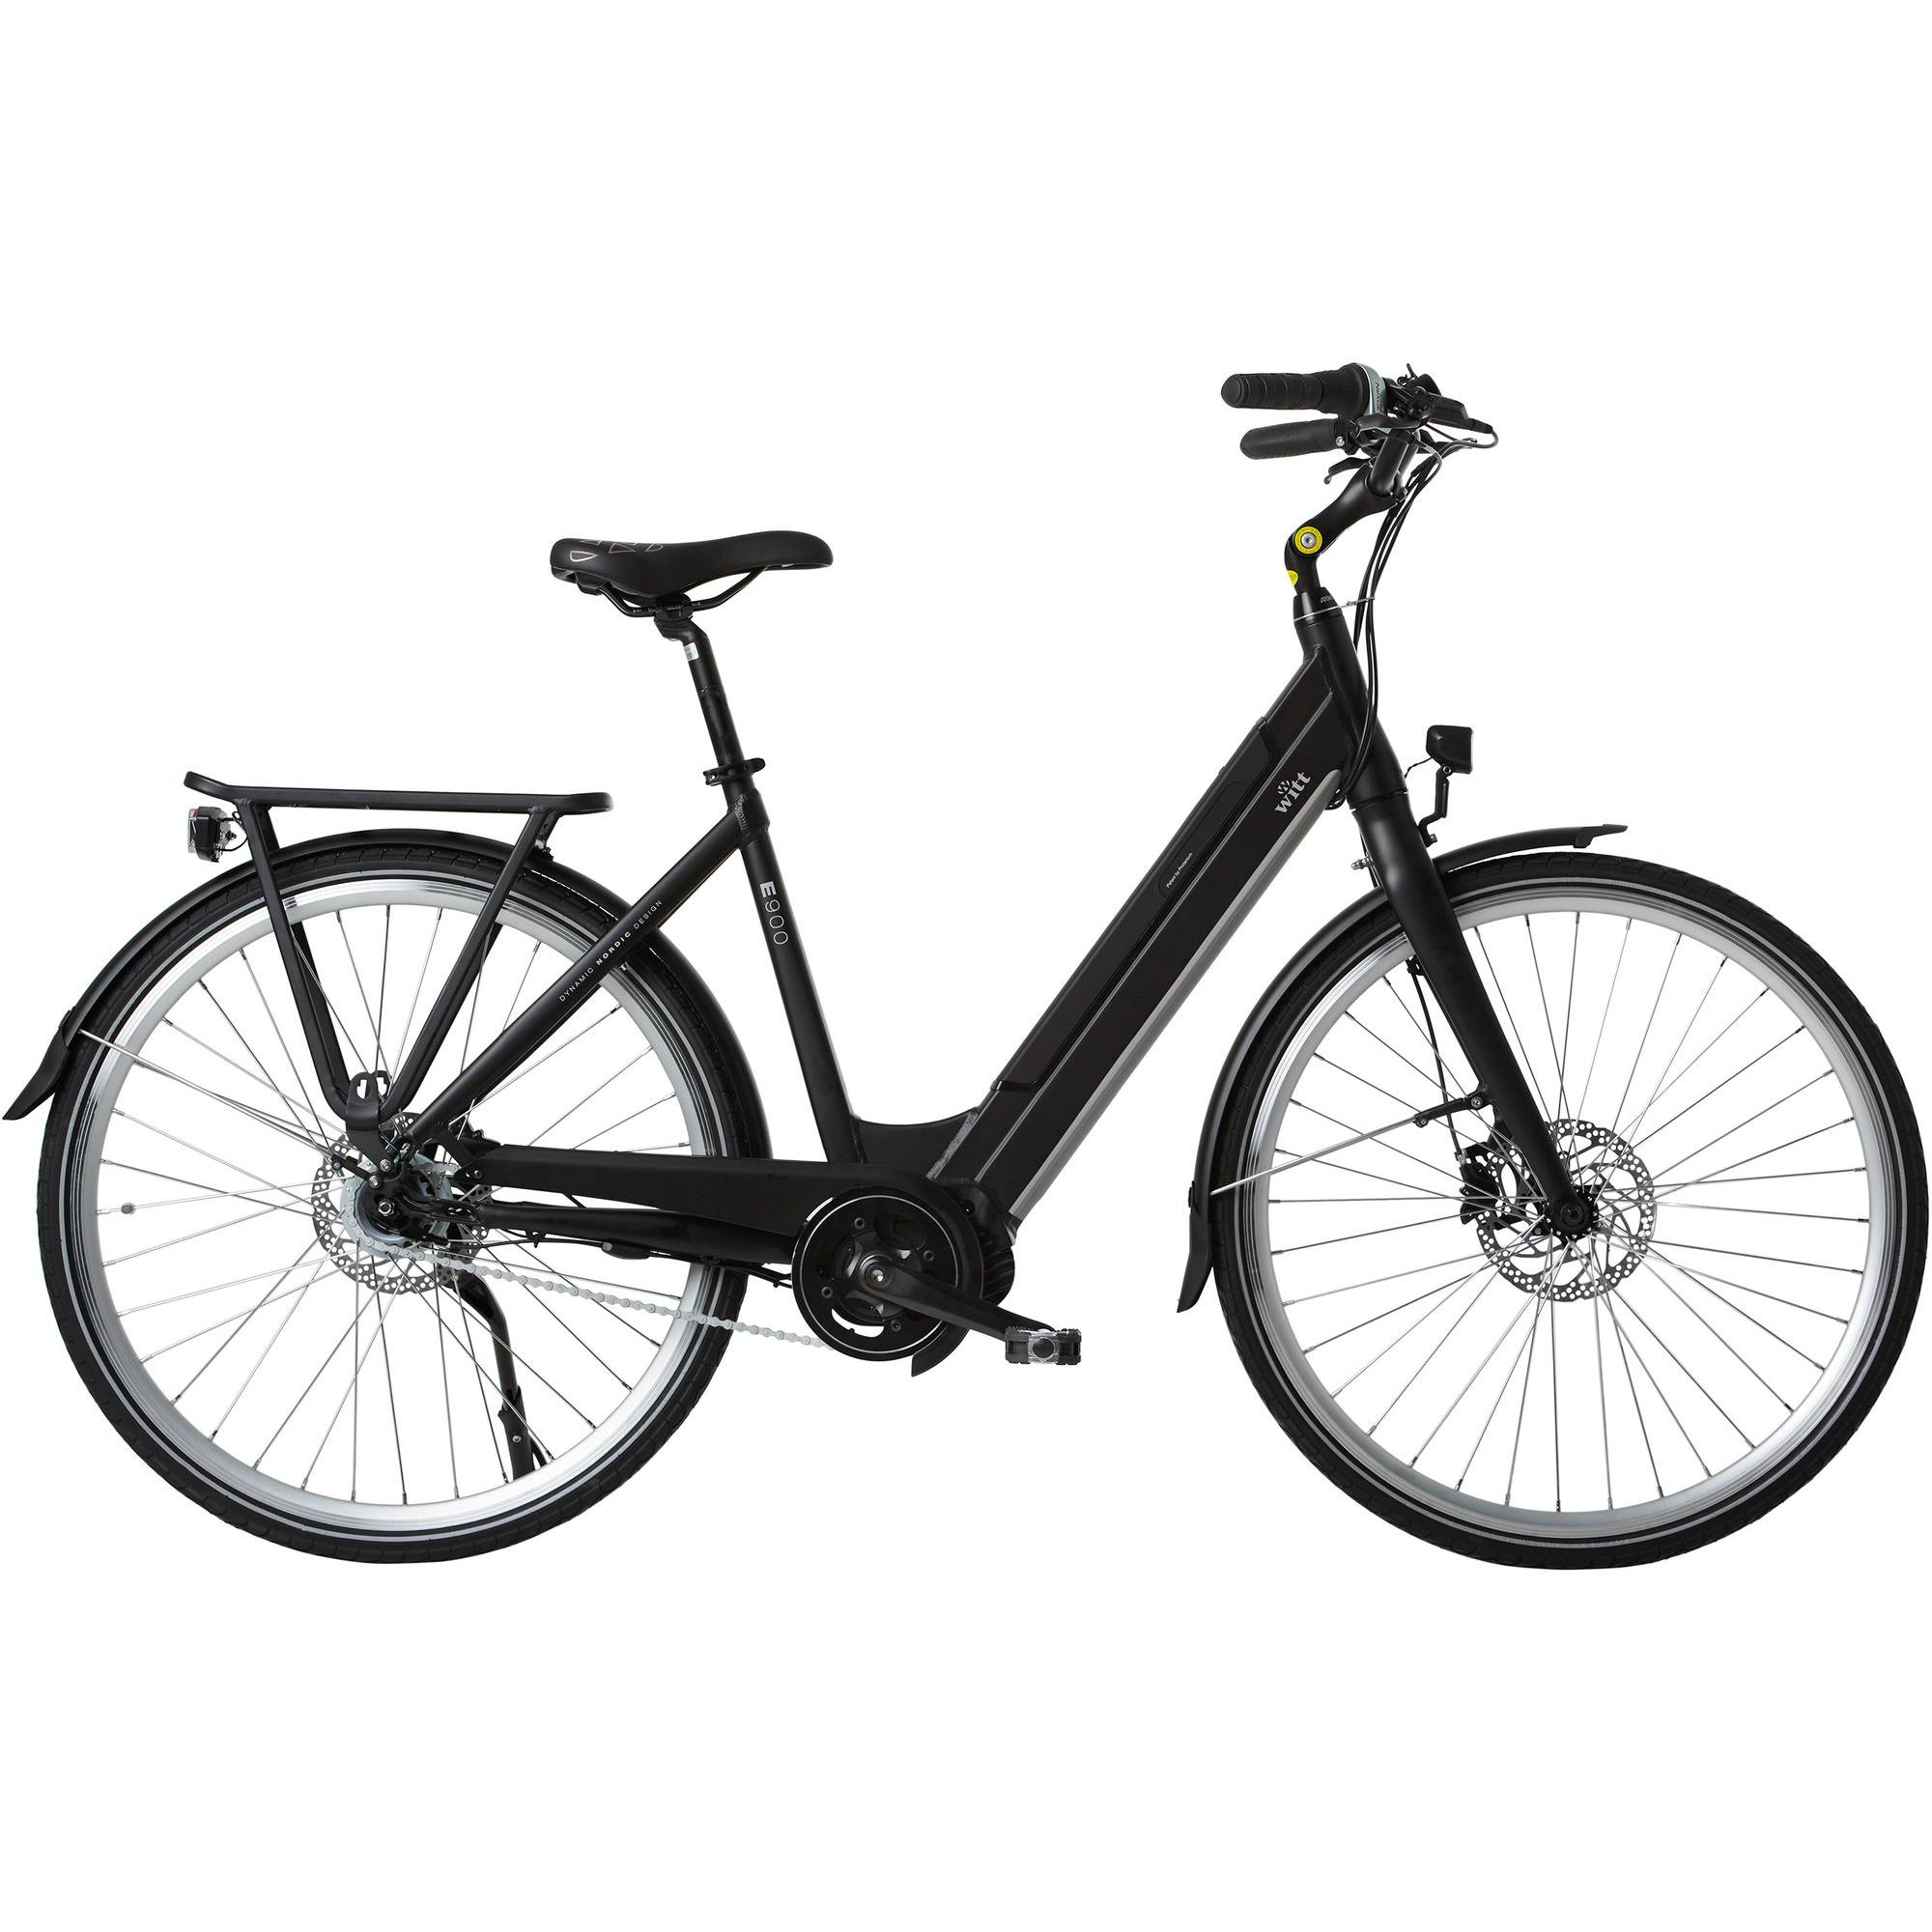 Witt E-bike E900 EL-sykkel, dame